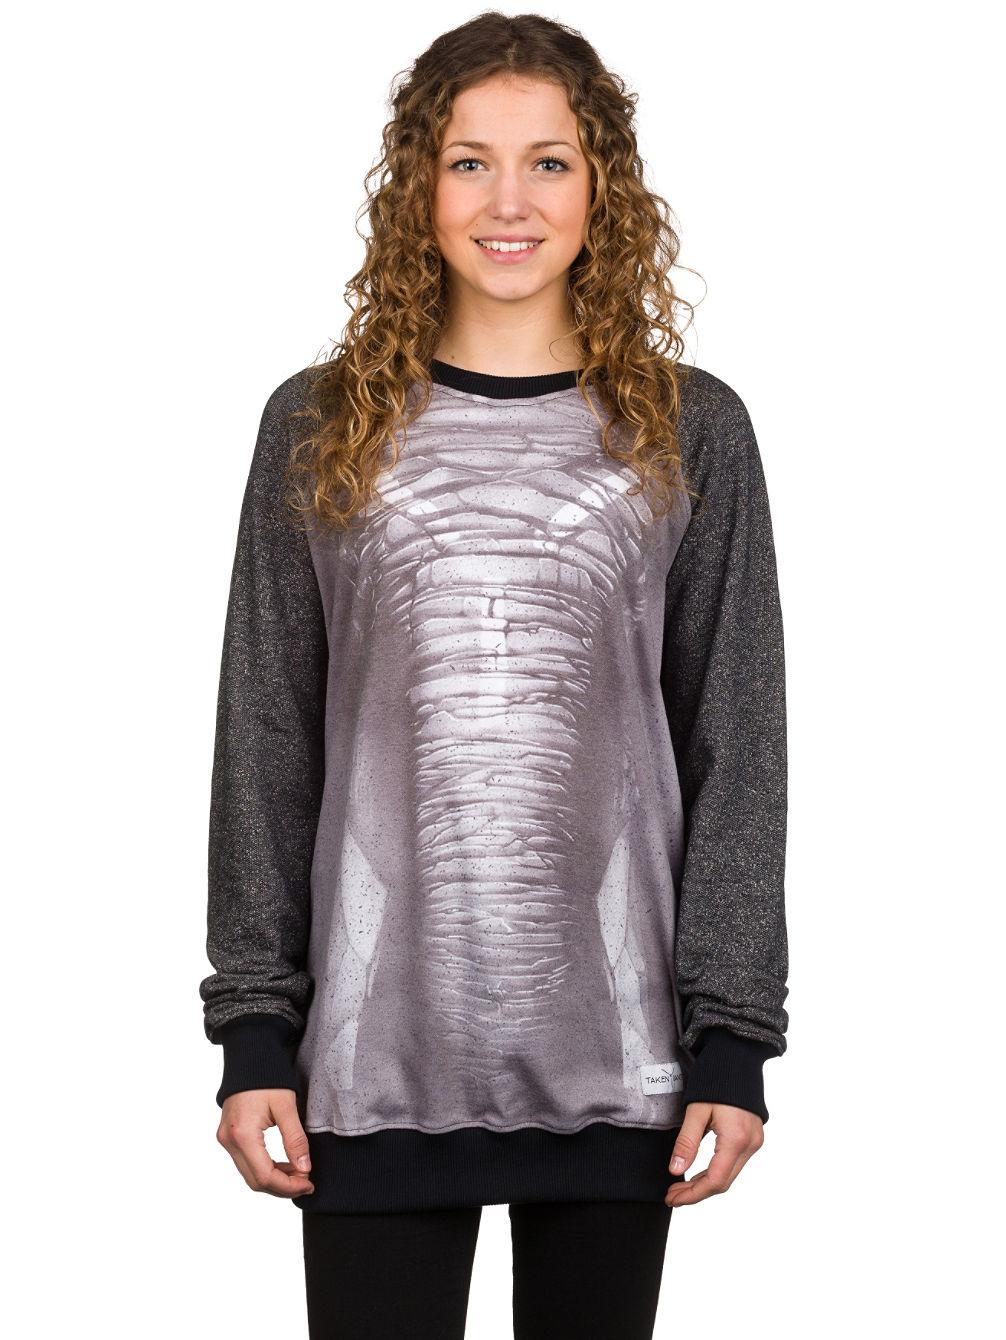 nnim clothing Eye To Eye Sweater